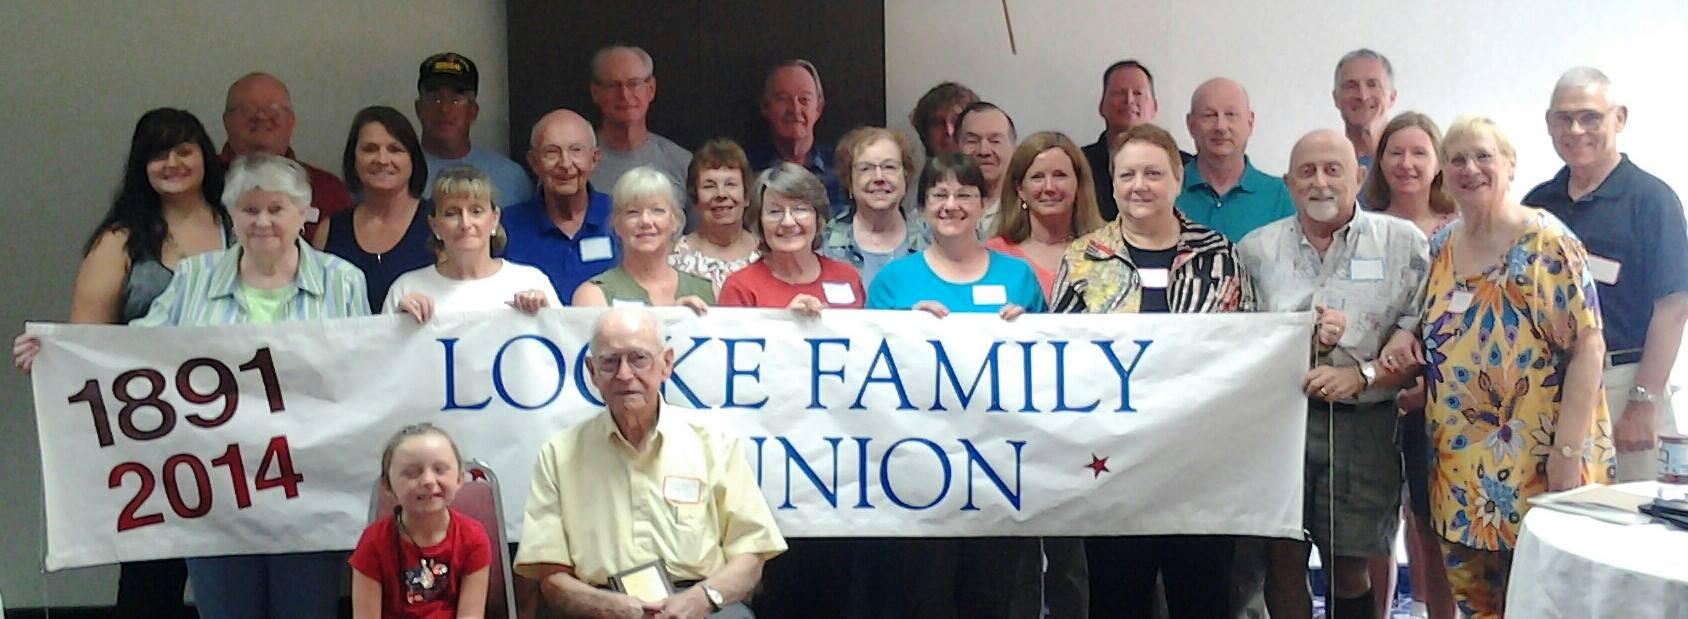 2014 Locke Family Association Reunion Gettysburg PA